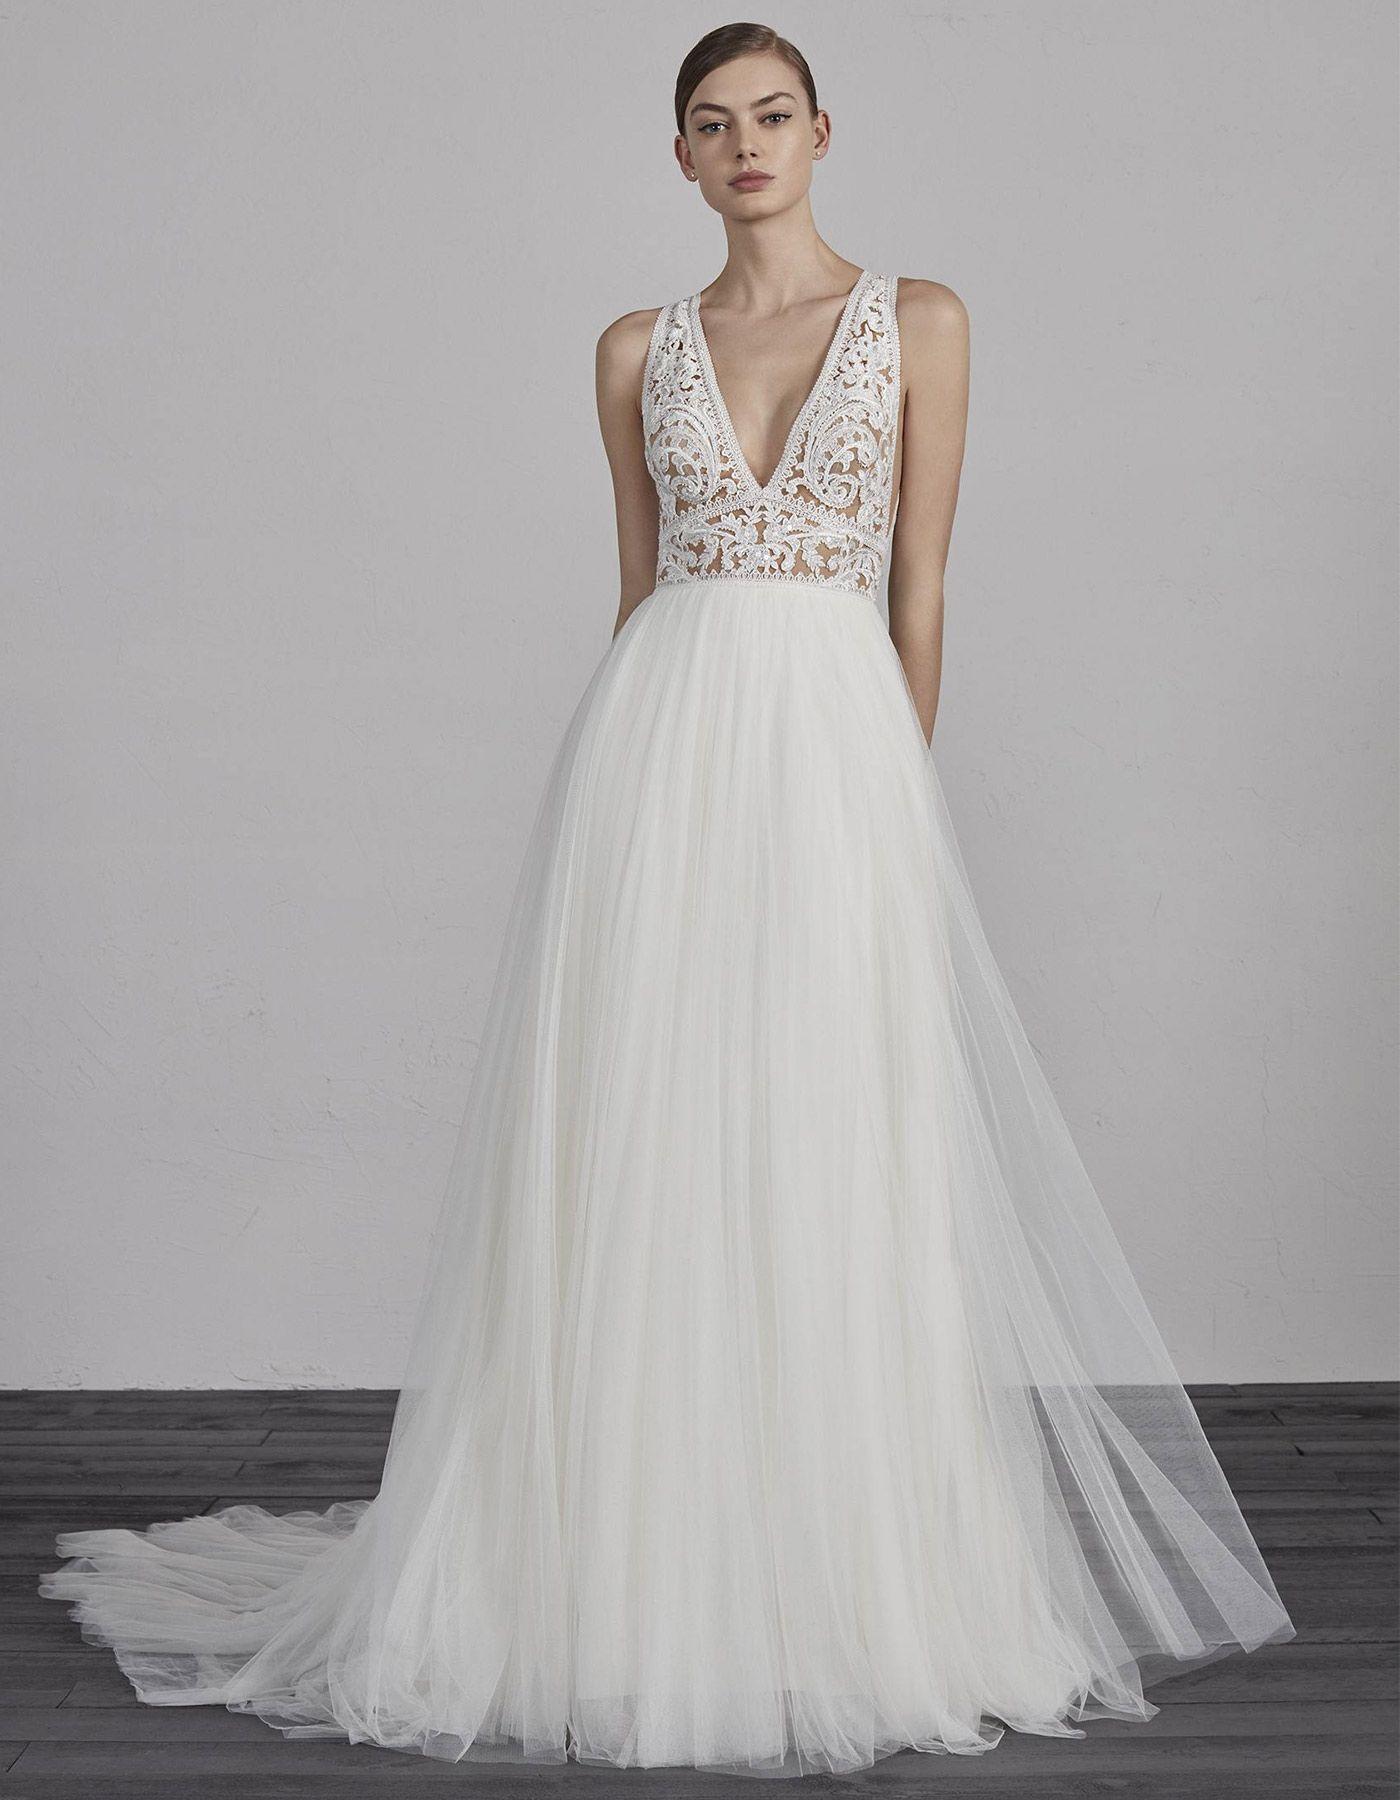 Soft Tulle Wedding Dress Espiga By Pronovias Pronovias Wedding Dress Wedding Dress For Short Women Short Girl Wedding Dress